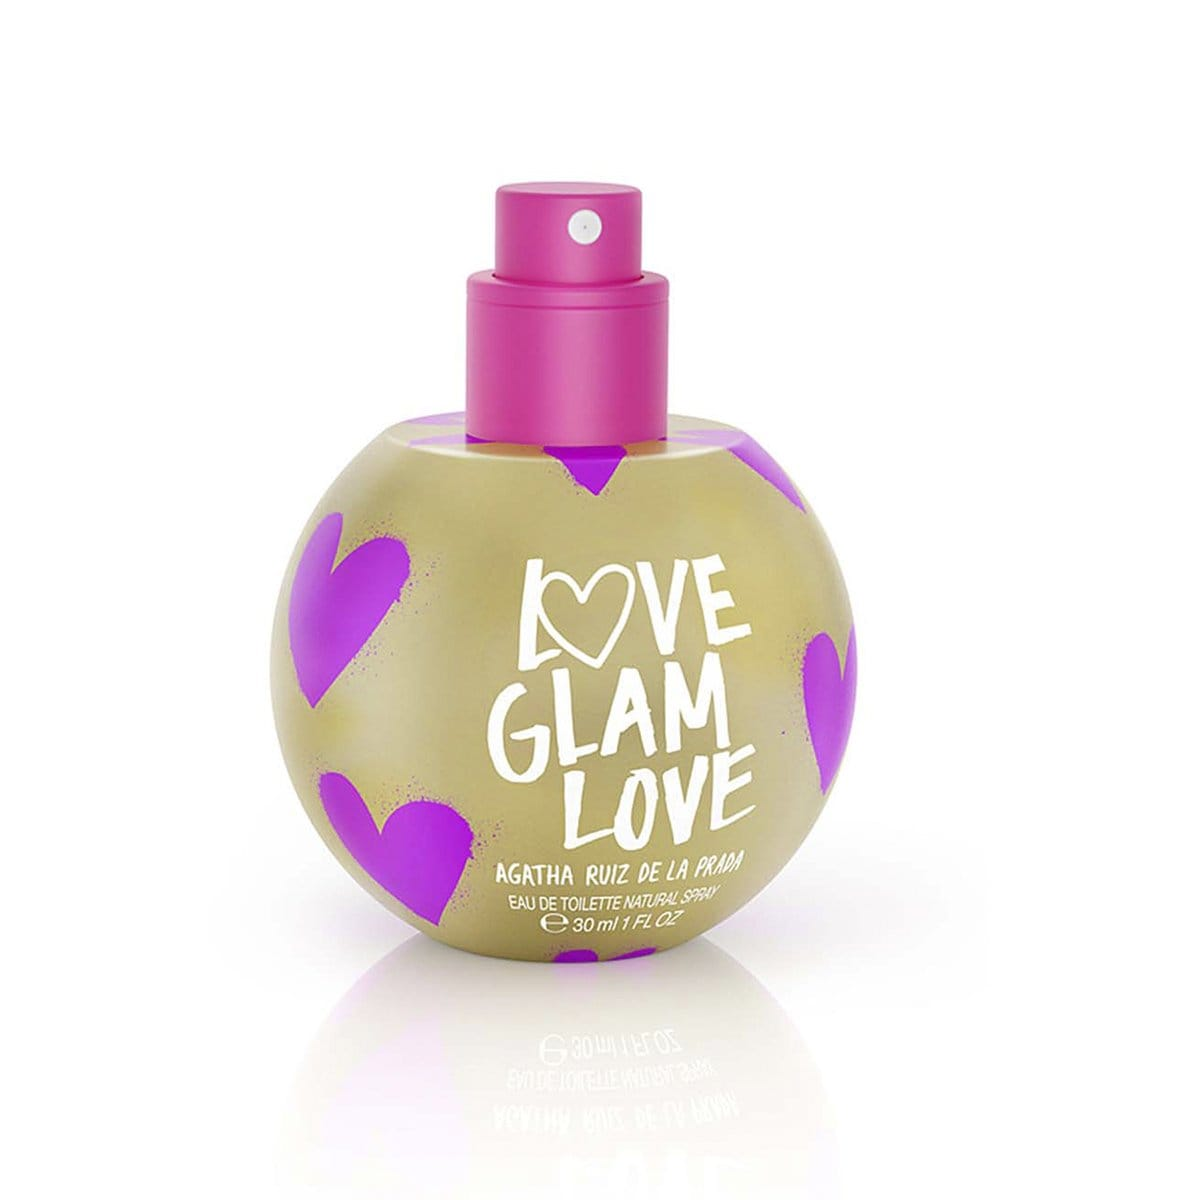 Fragancia para Dama, Agatha Ruiz de la Prada Love Glam Love Bubble Edt 30Ml